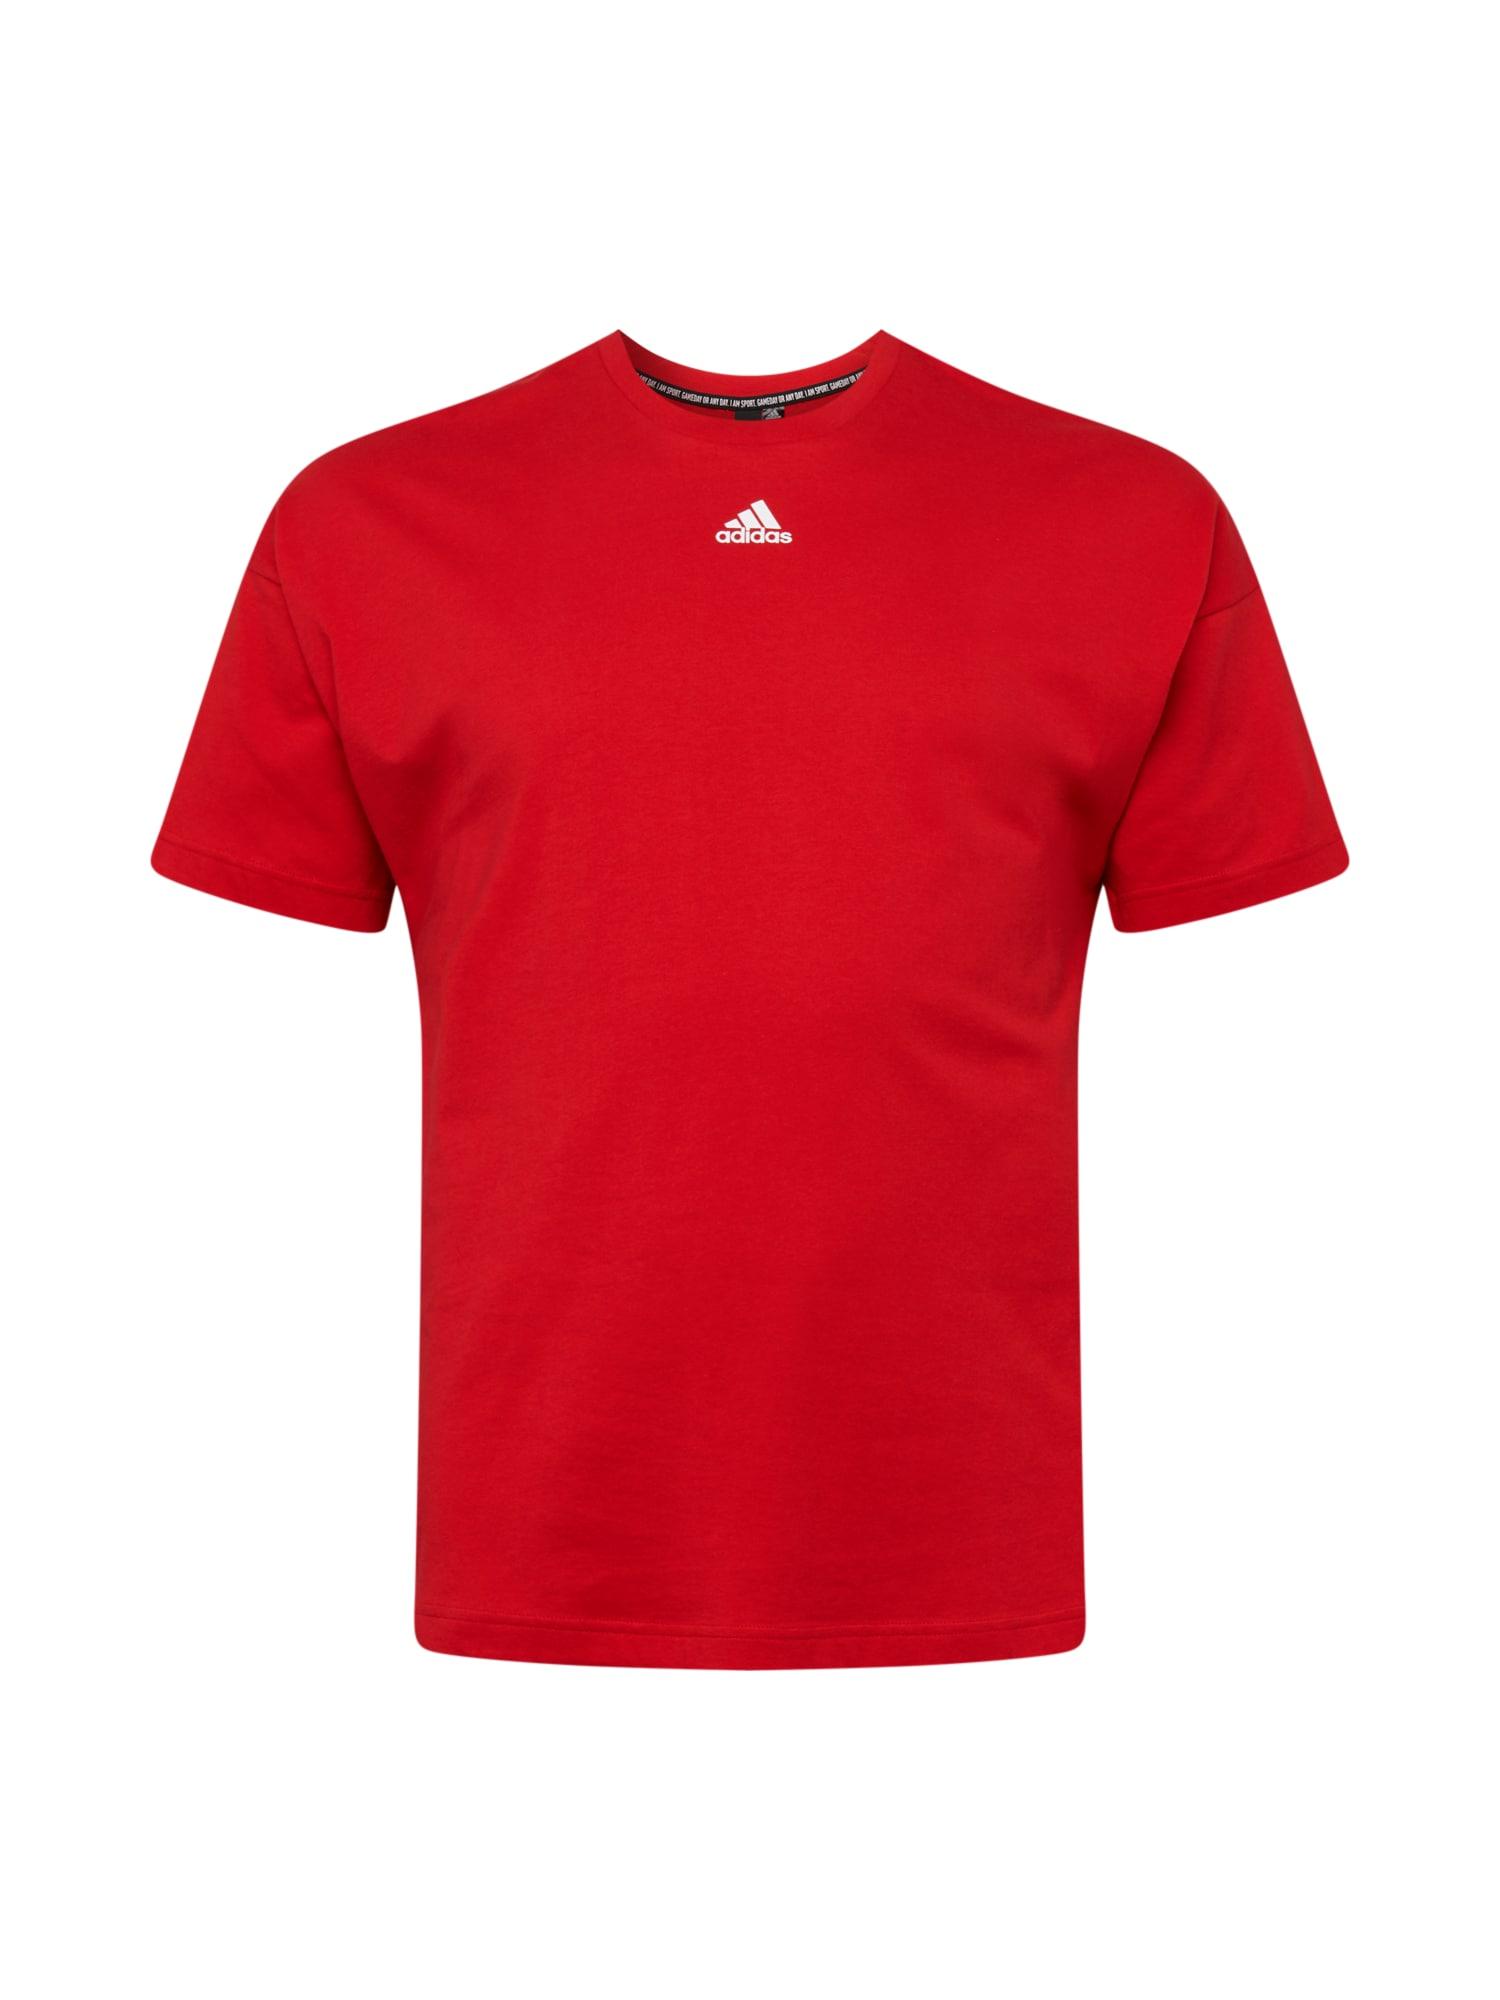 ADIDAS PERFORMANCE Funkční tričko  červená / bílá